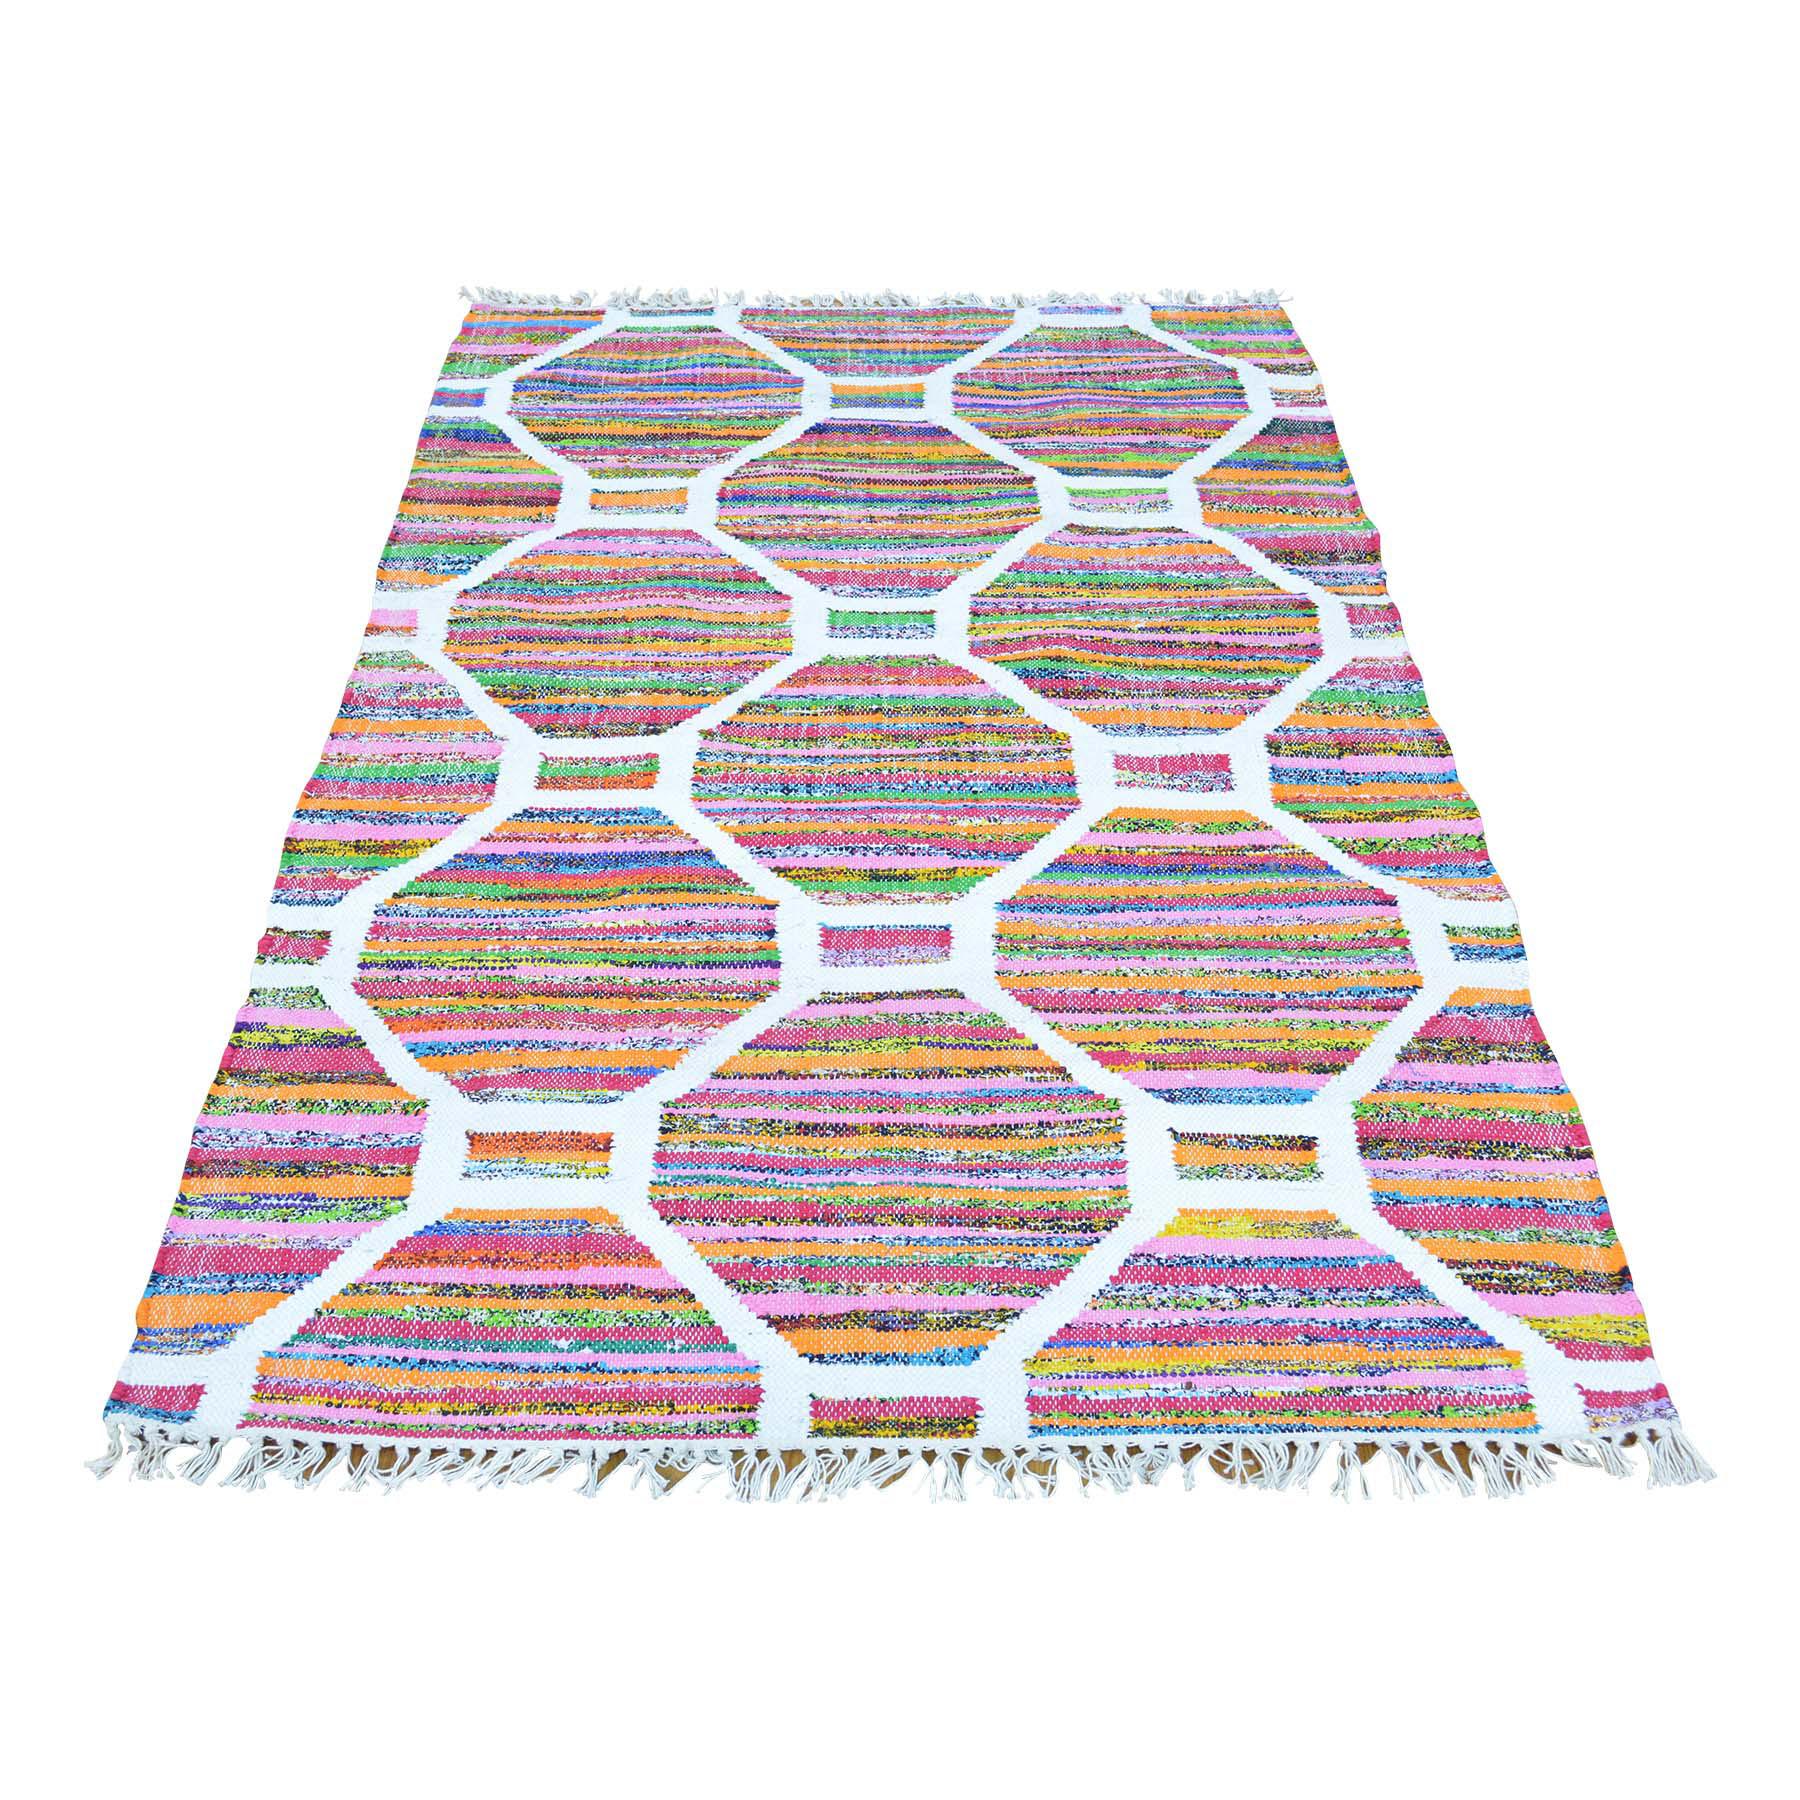 3-5 x5-7  Flat Weave Kilim Cotton And Sari Silk Hand Woven Oriental Rug